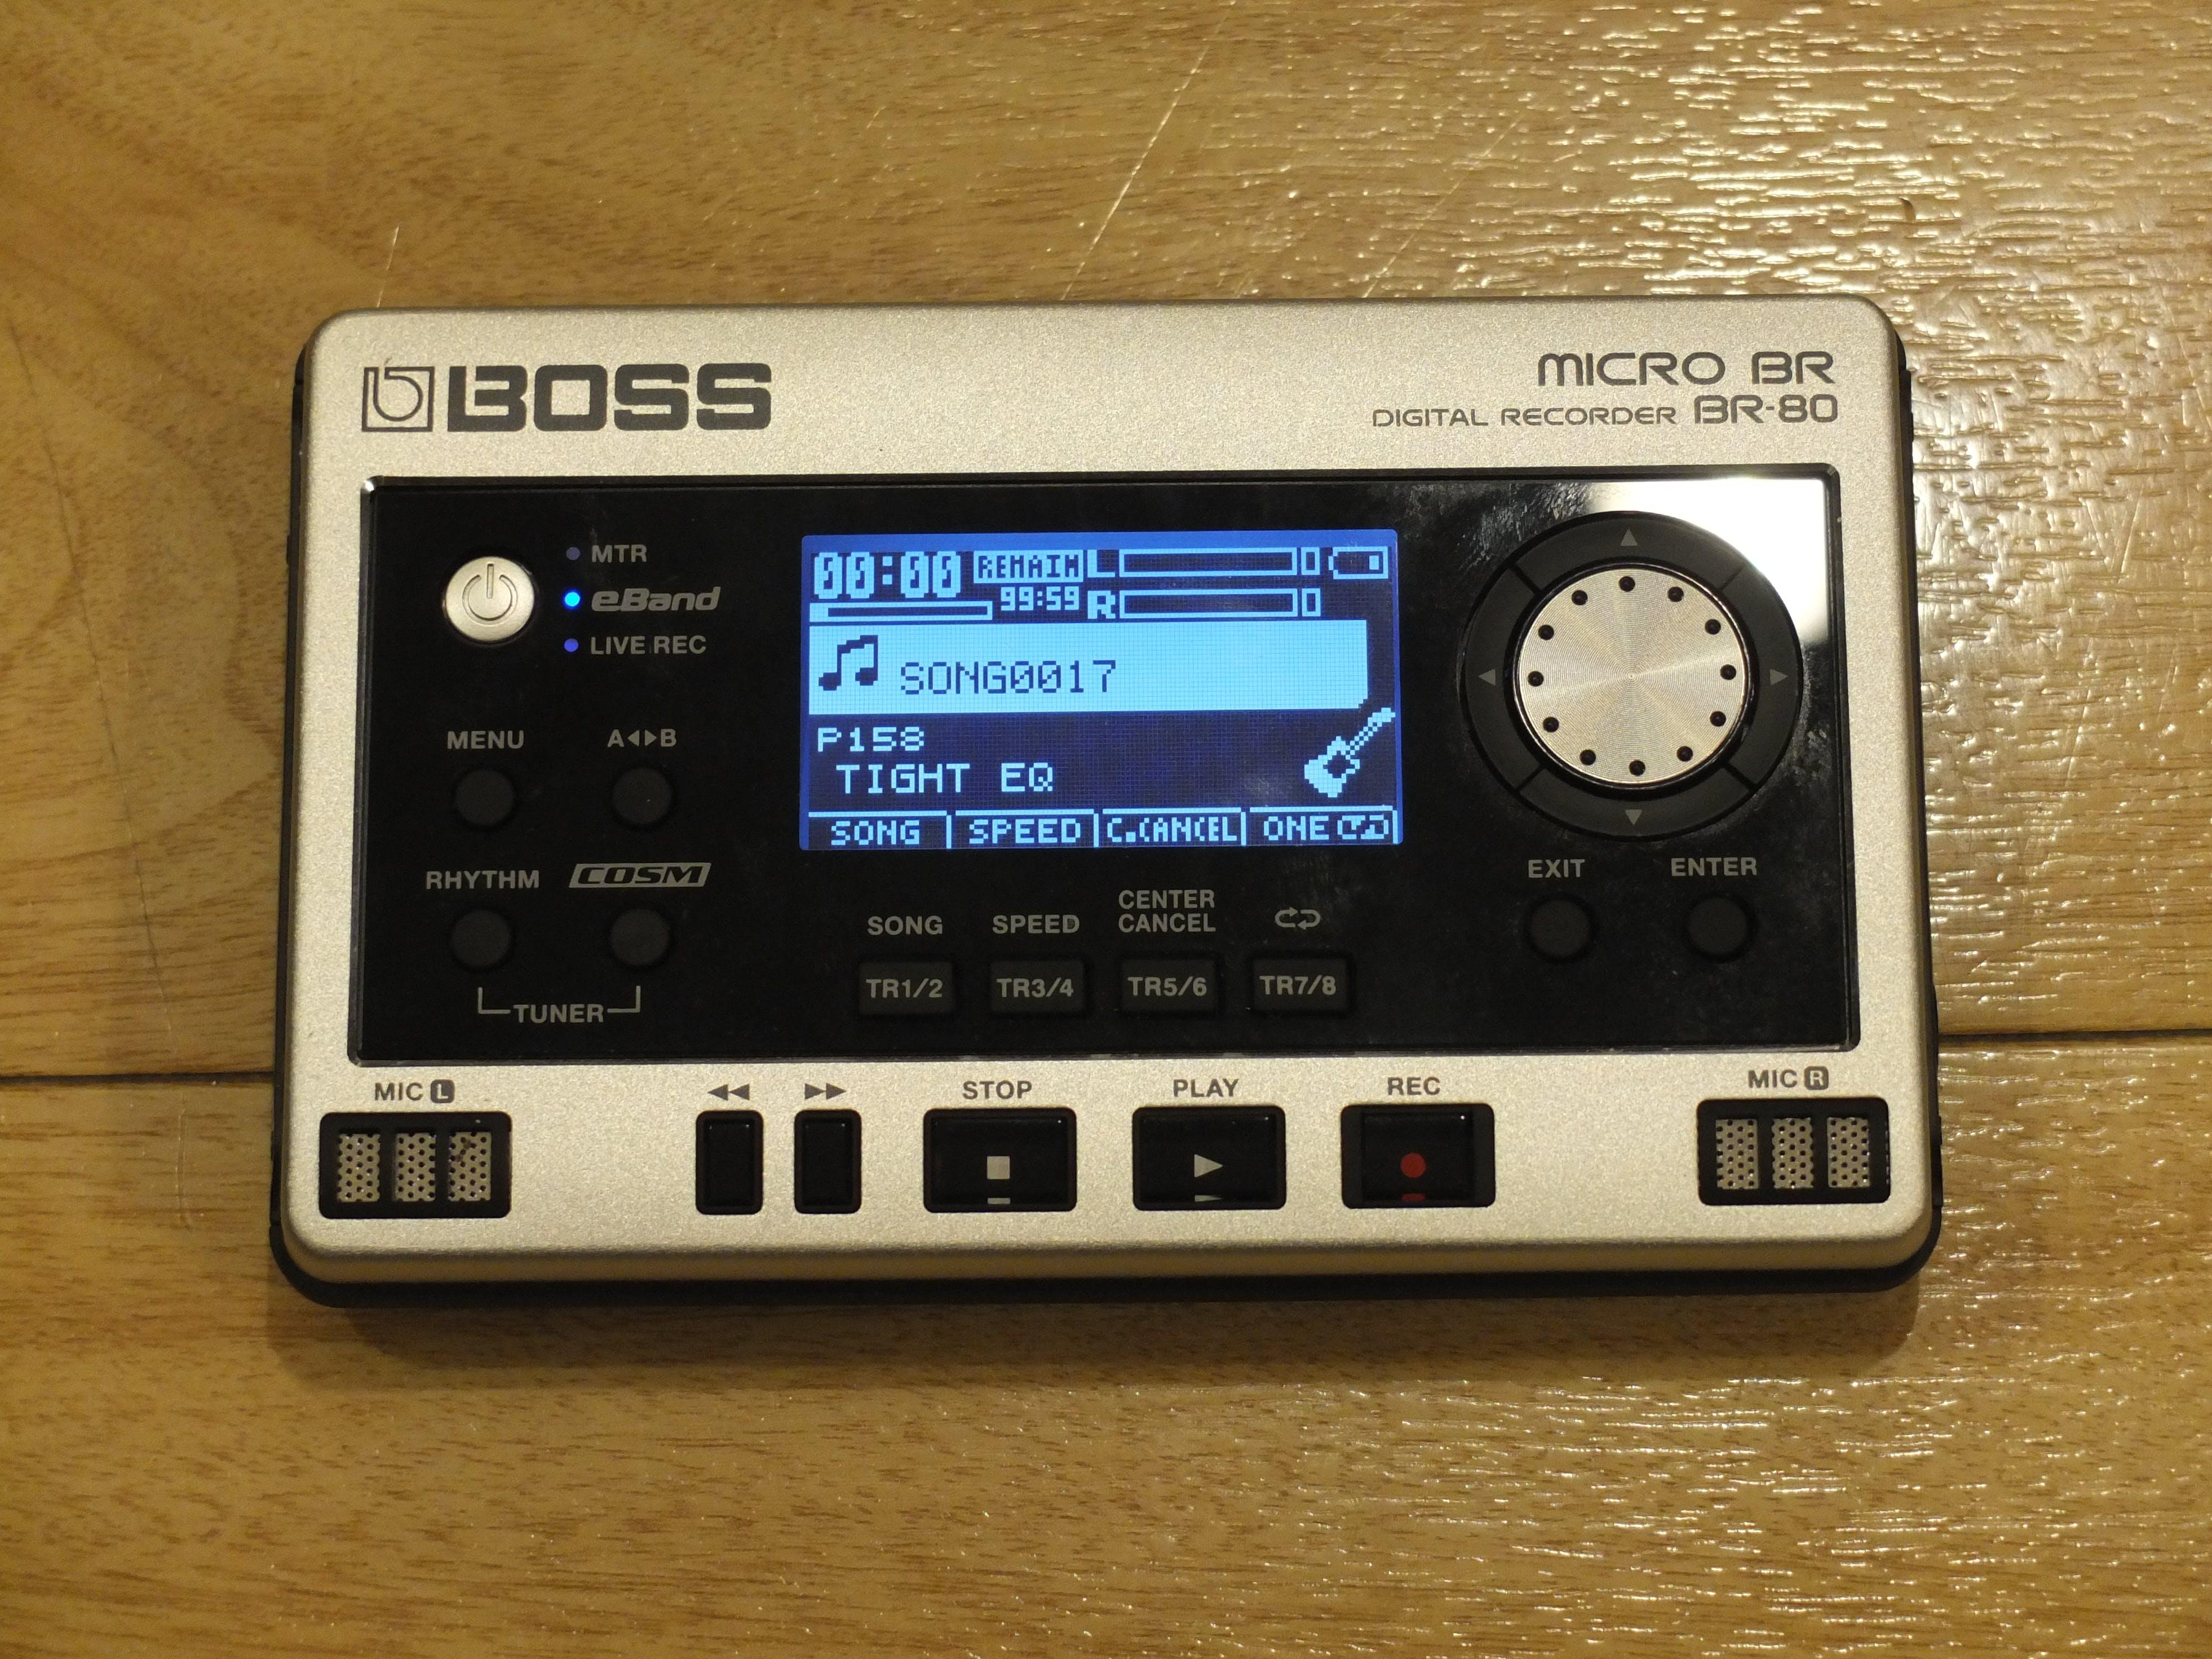 BOSS MICRO BR-80 DIGITAL RECORDER 32GB SD SDHC MEMORY CARD UPGRADE